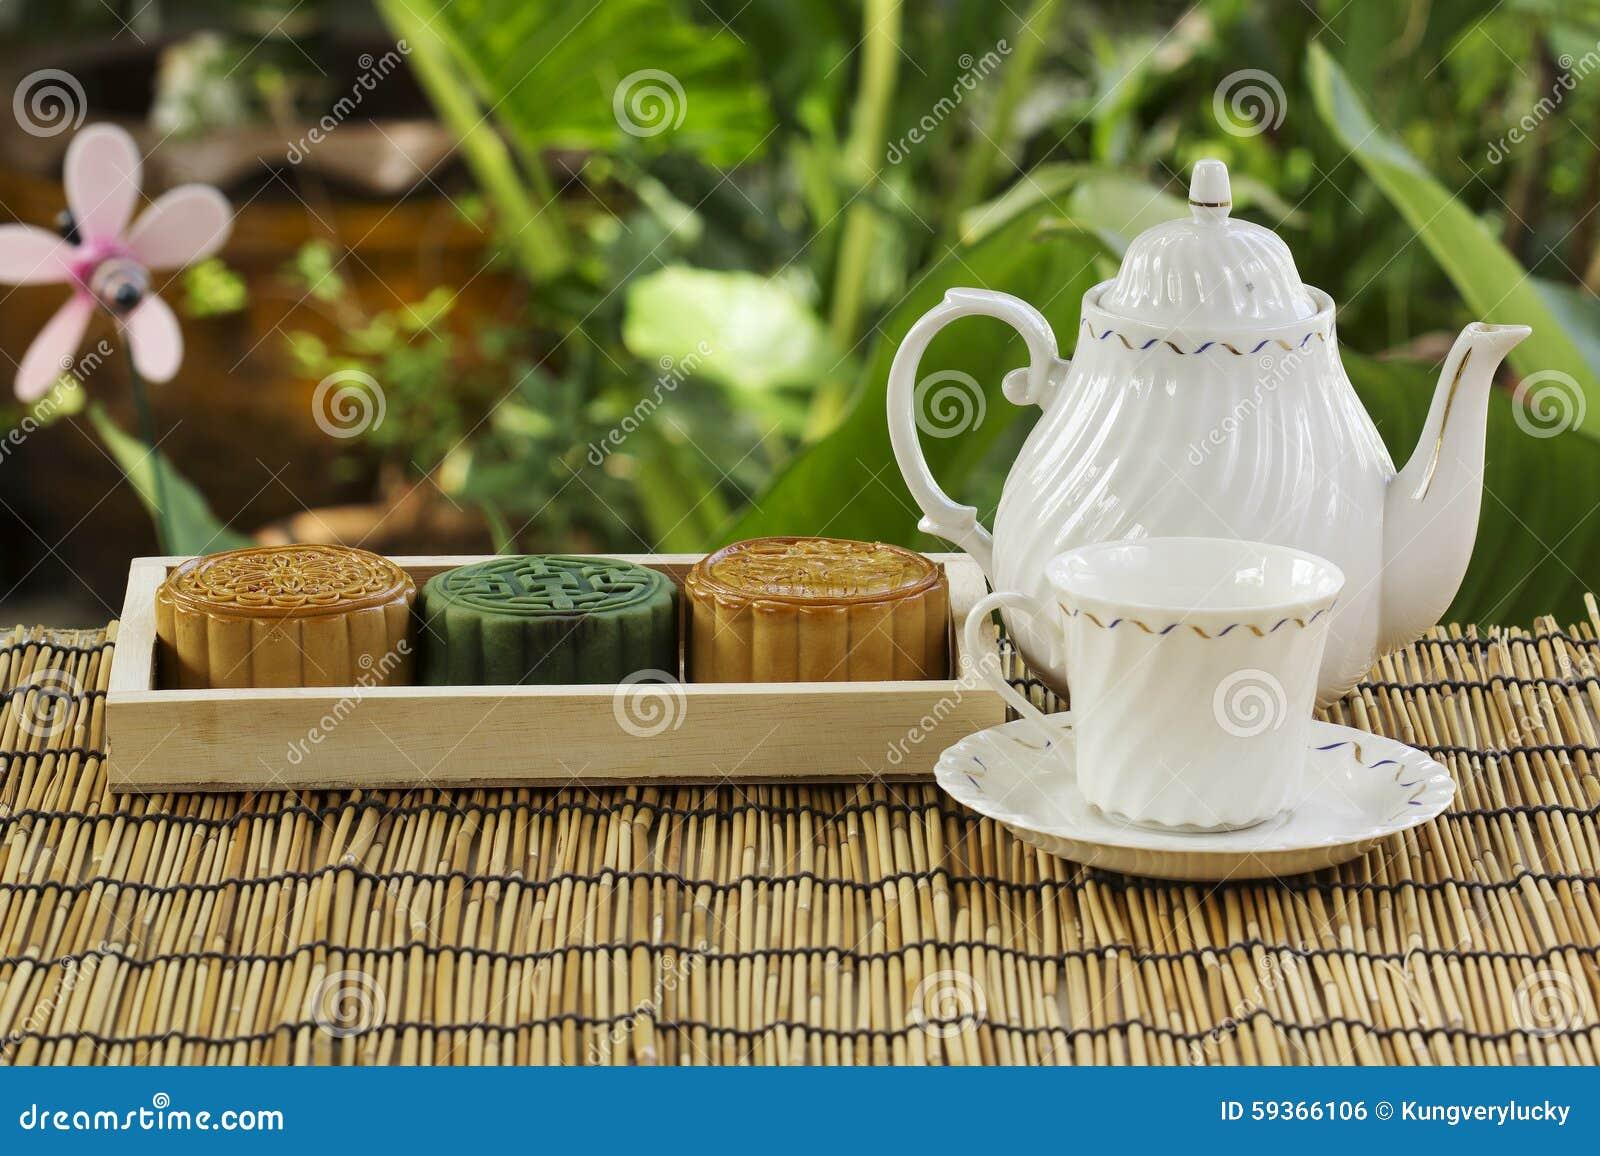 Matcha Green Tea Festival Foods